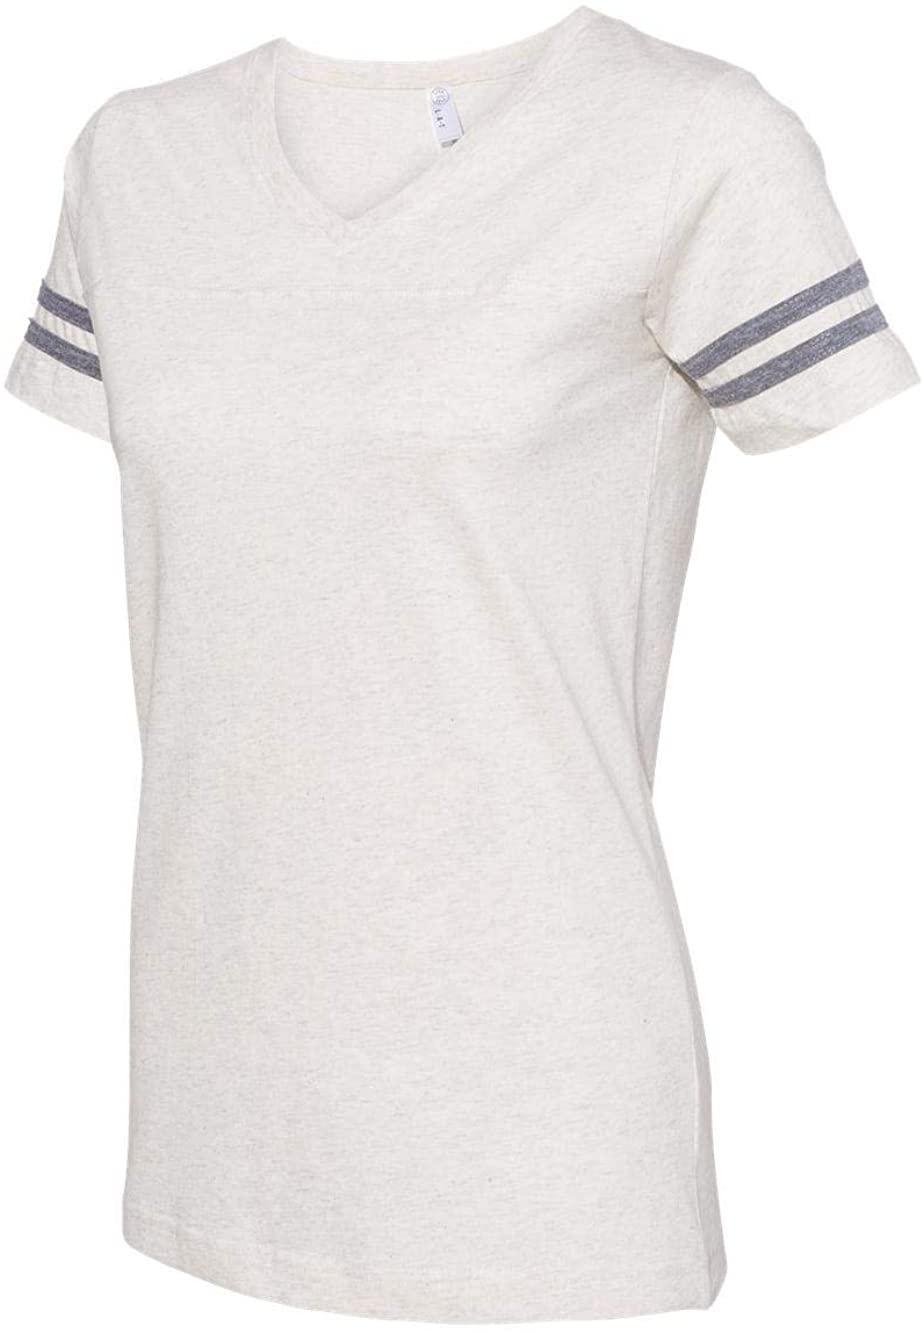 LAT Women's Football T-Shirt, Natural Heather/Grnite Heather, Large